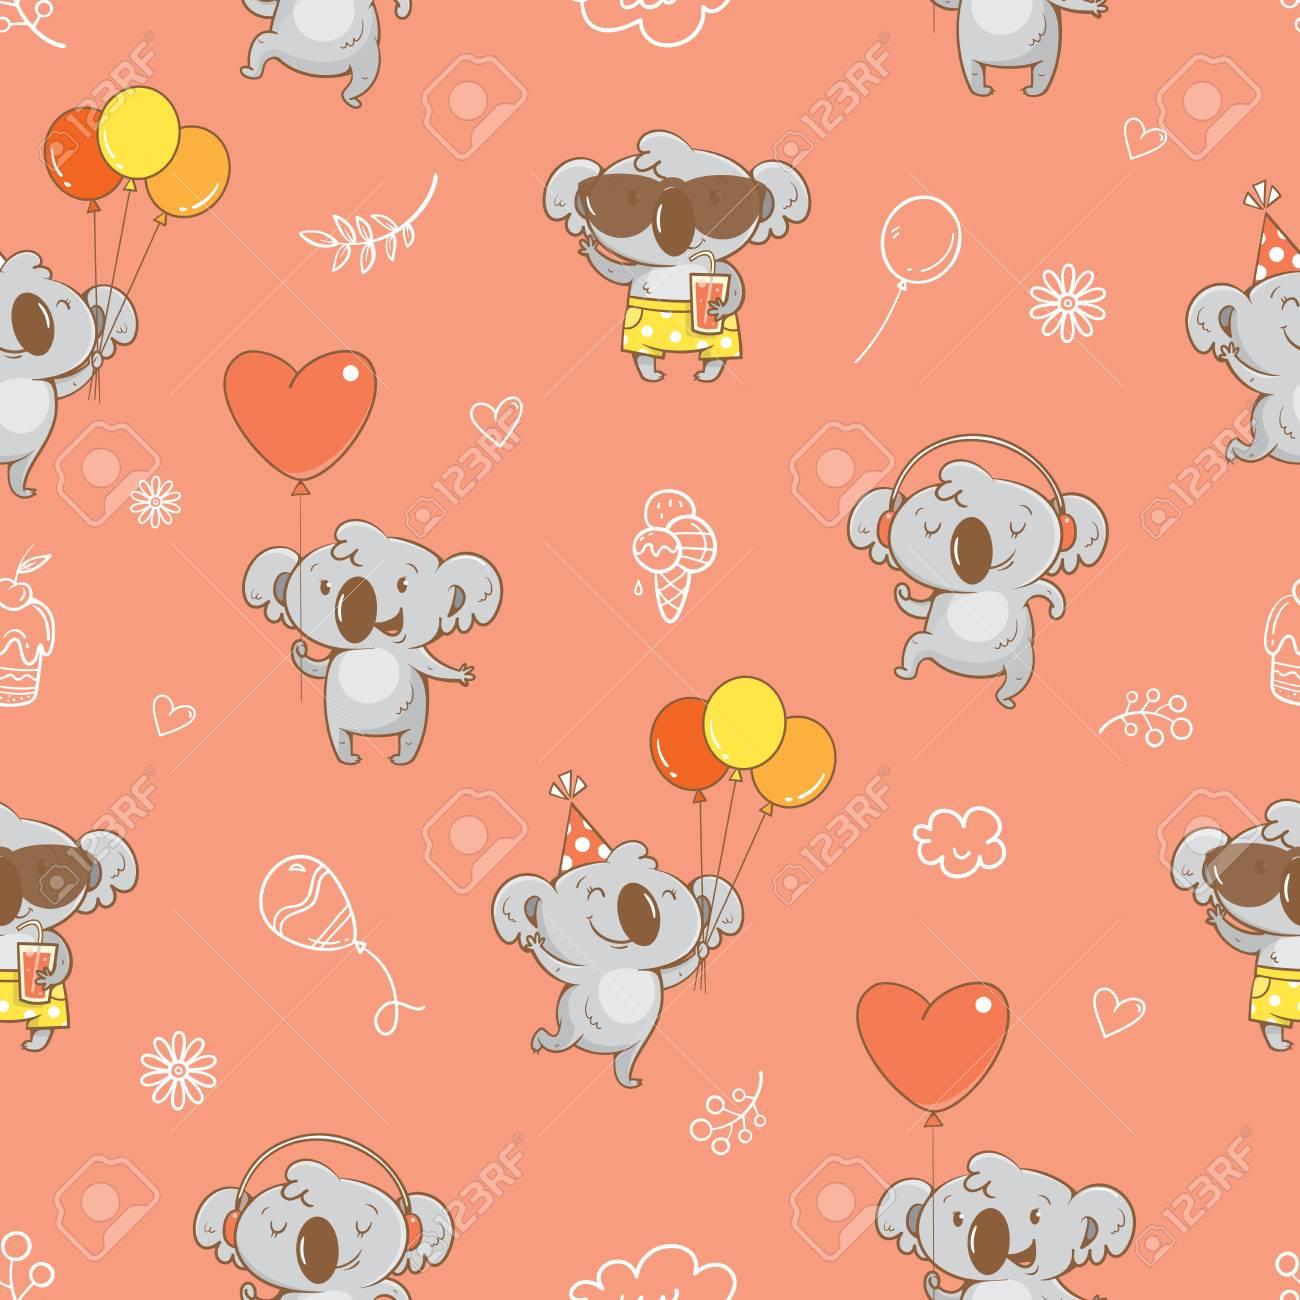 Most Inspiring Wallpaper Koala Cartoon - 99555256-seamless-pattern-with-cute-cartoon-koalas-on-pink-background-vector-contour-image-little-funny-baby-  Pic_94322   .jpg